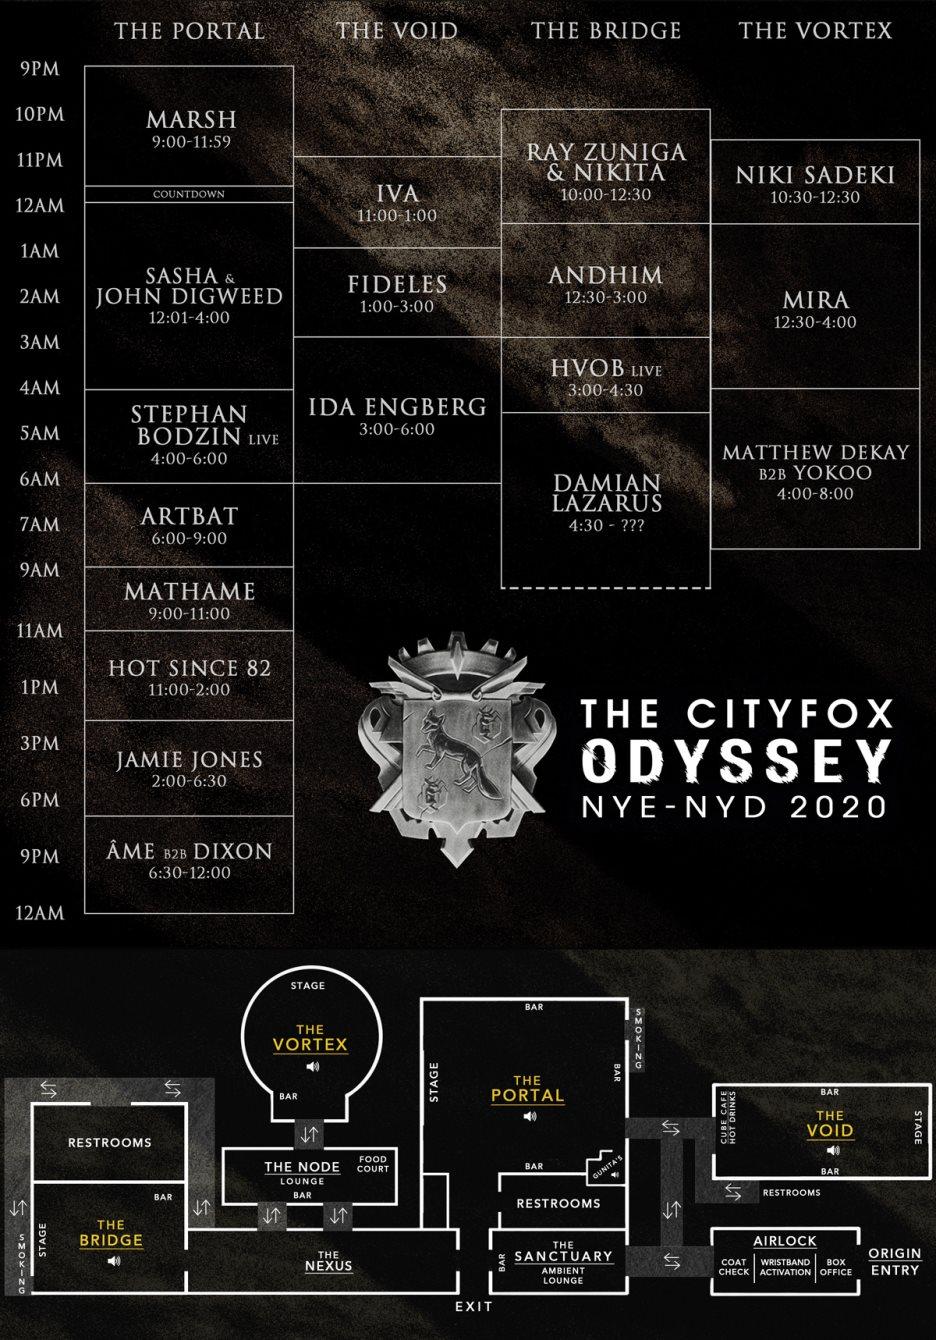 Cityfox Odyssey NYE & NYD 2020: Âme b2b Dixon, Hot Since 82, Sasha & John Digweed & More - Flyer back